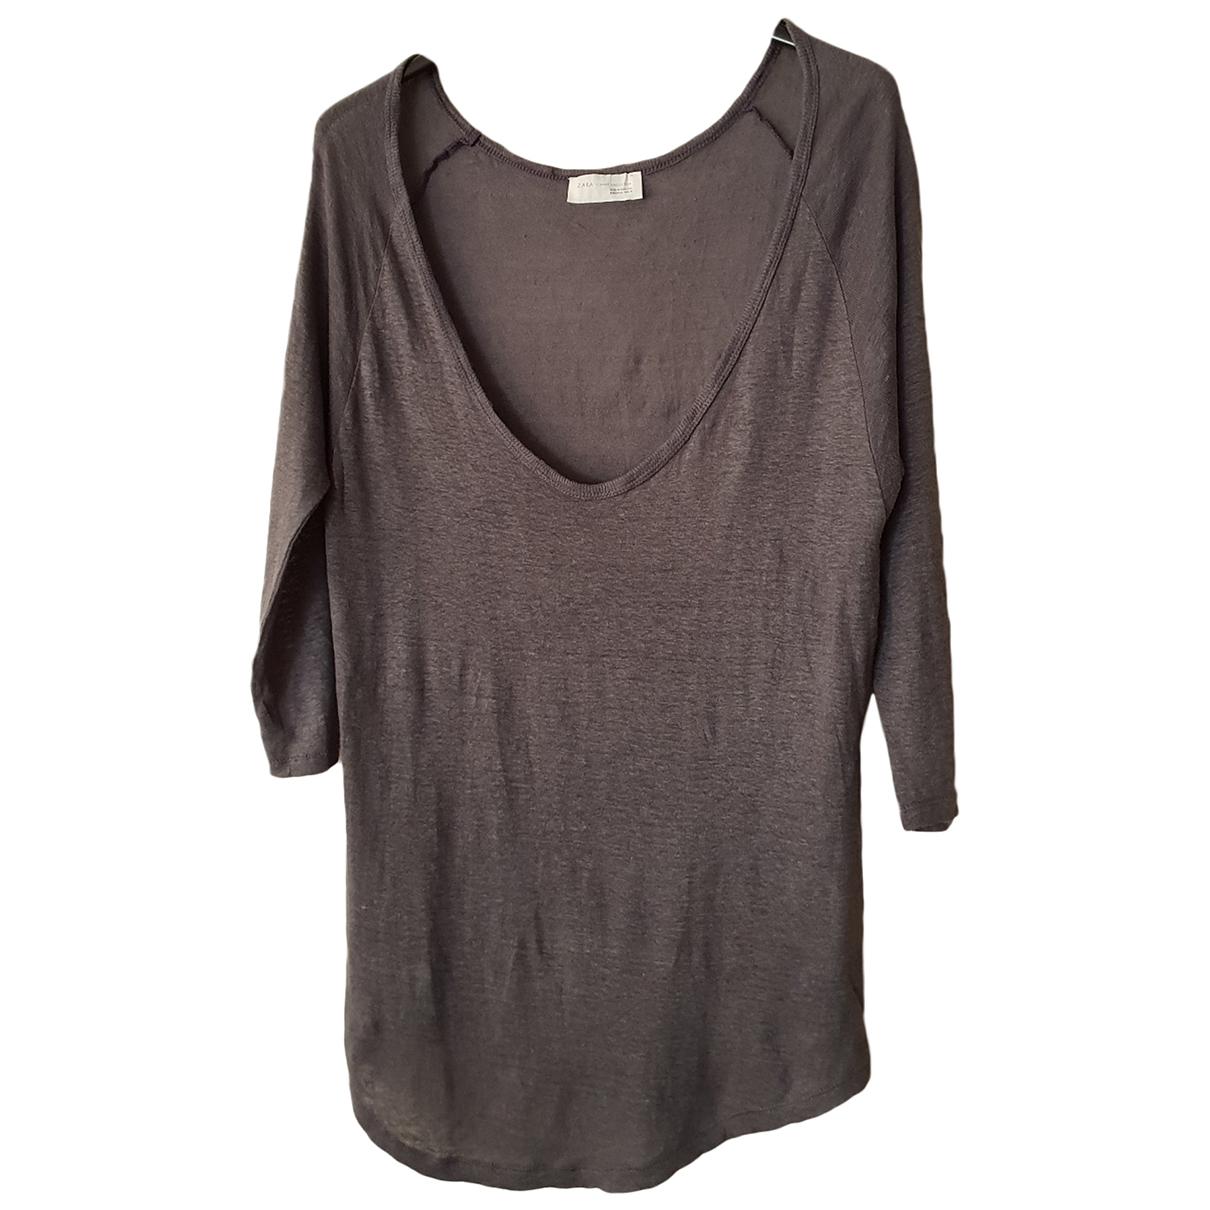 Zara - Top   pour femme en lin - gris